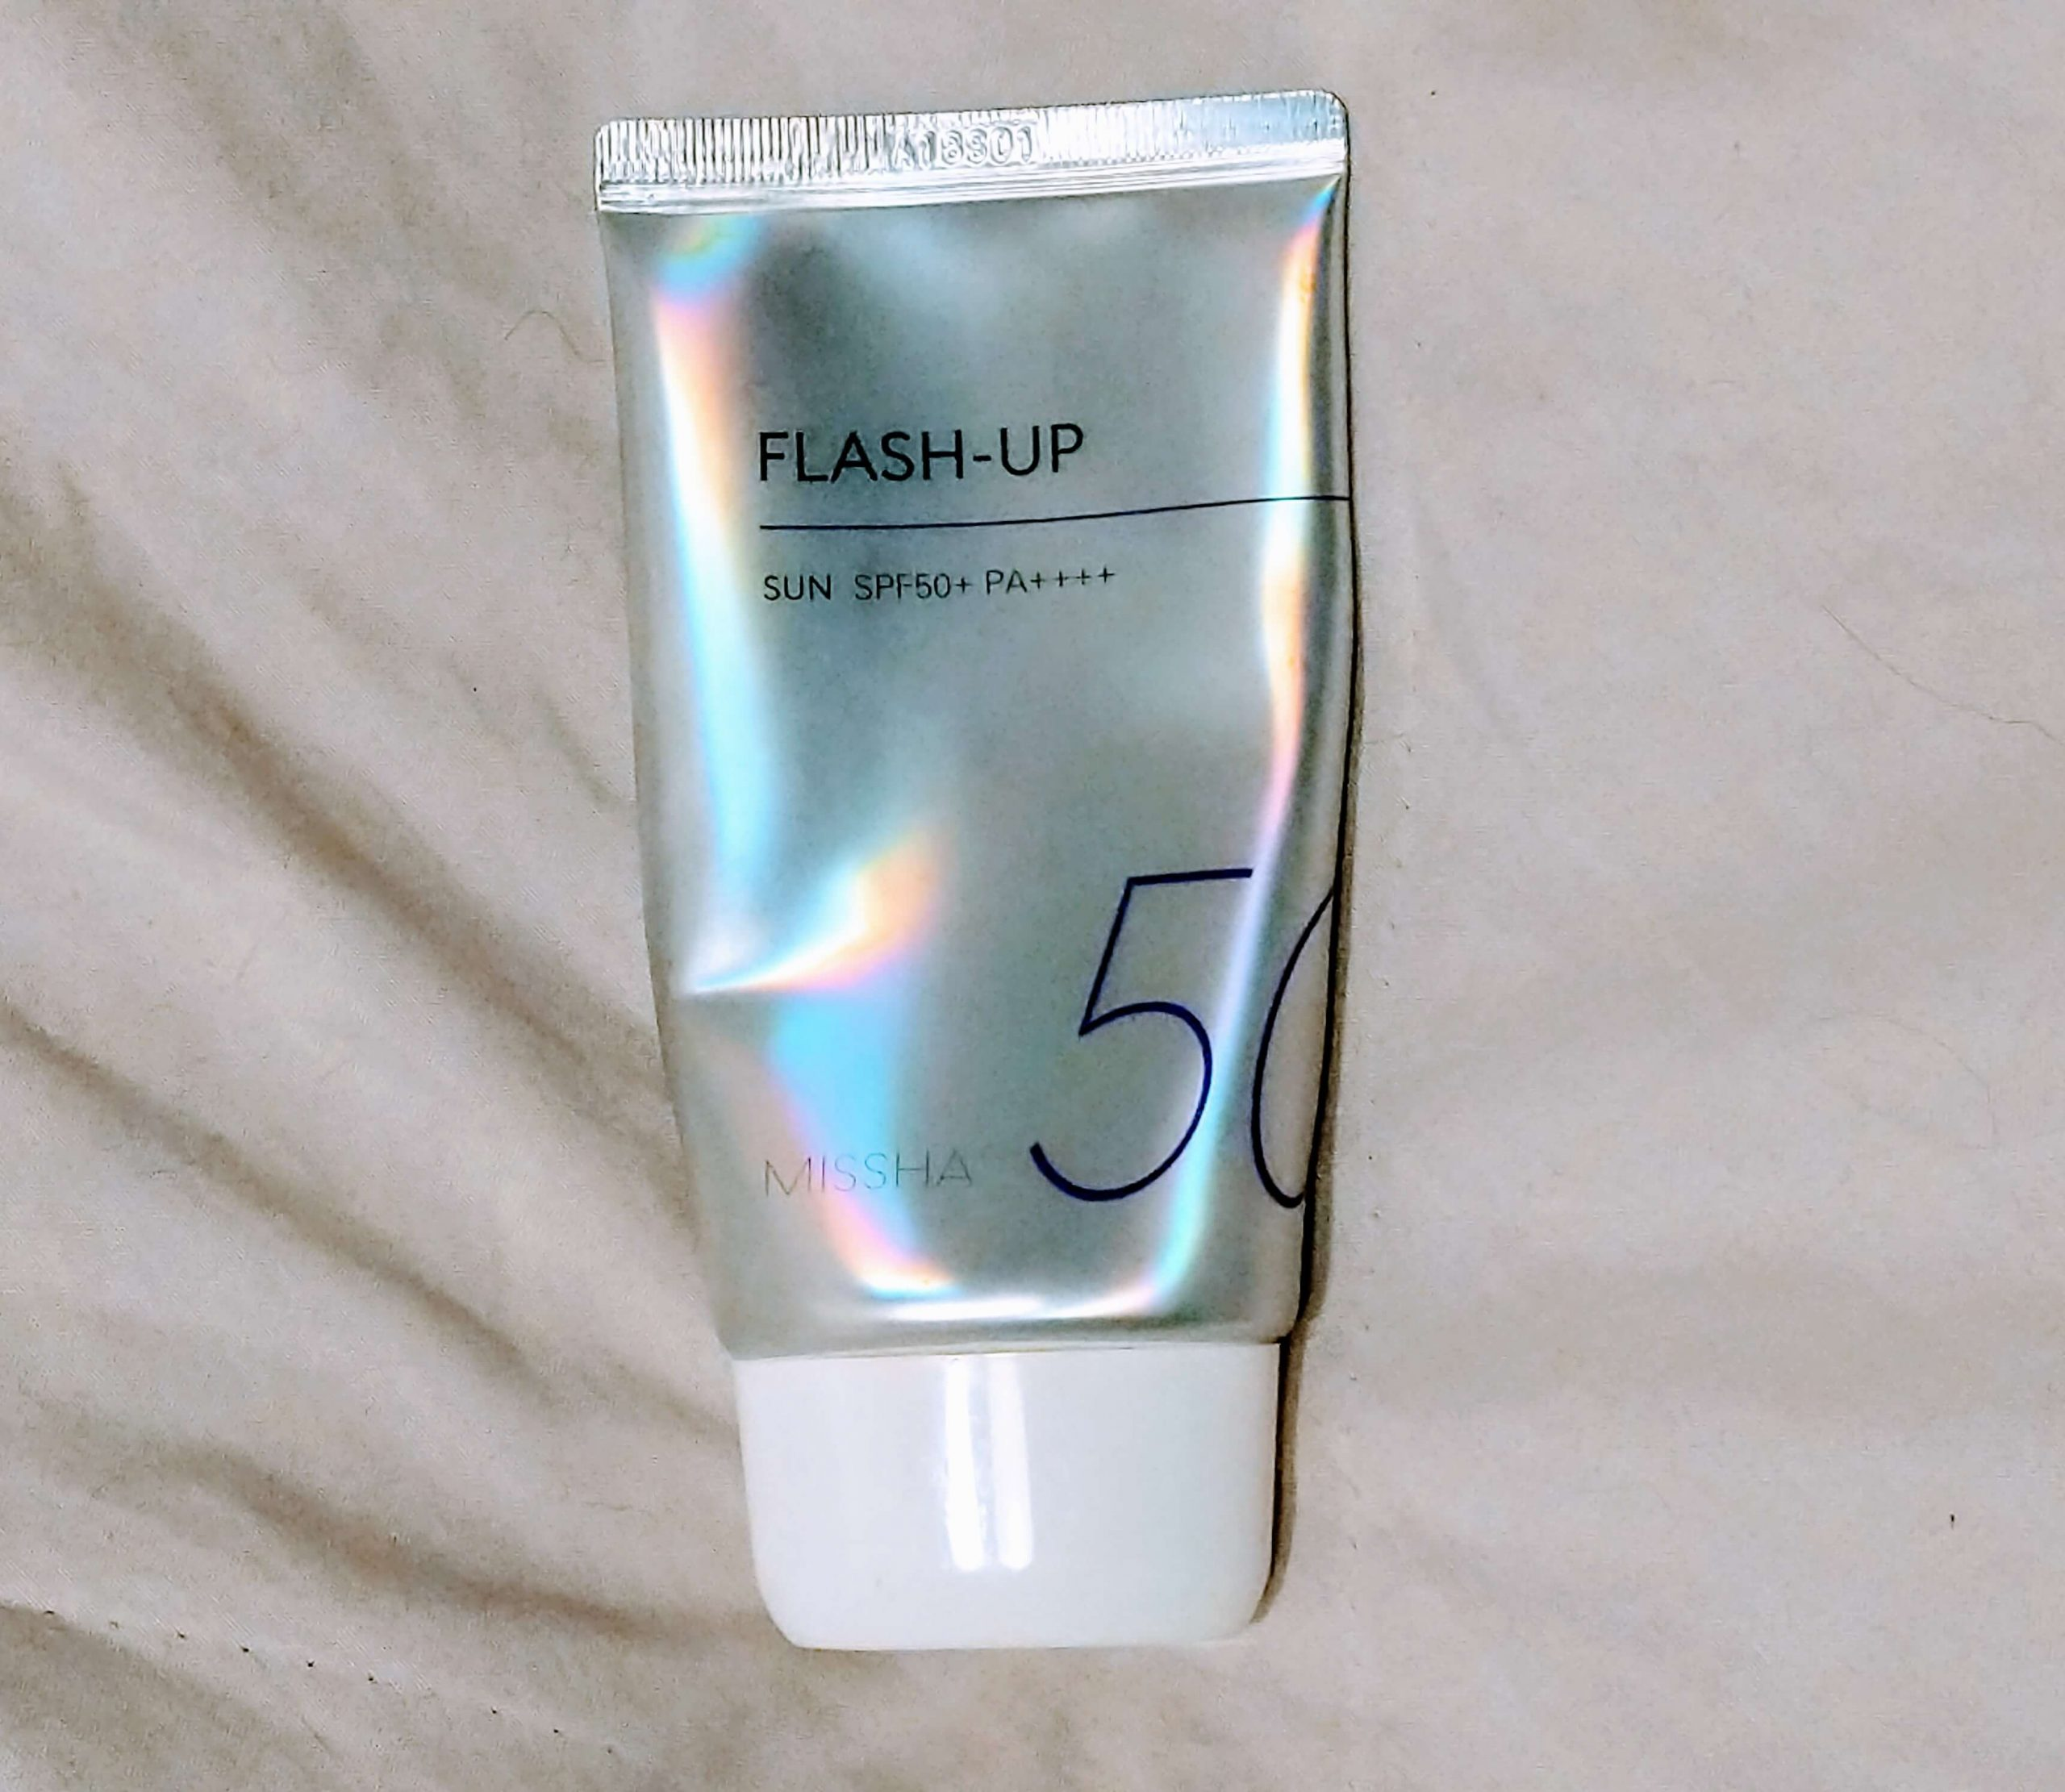 MISSHA Flash up Sun Spf50+ Pa++++